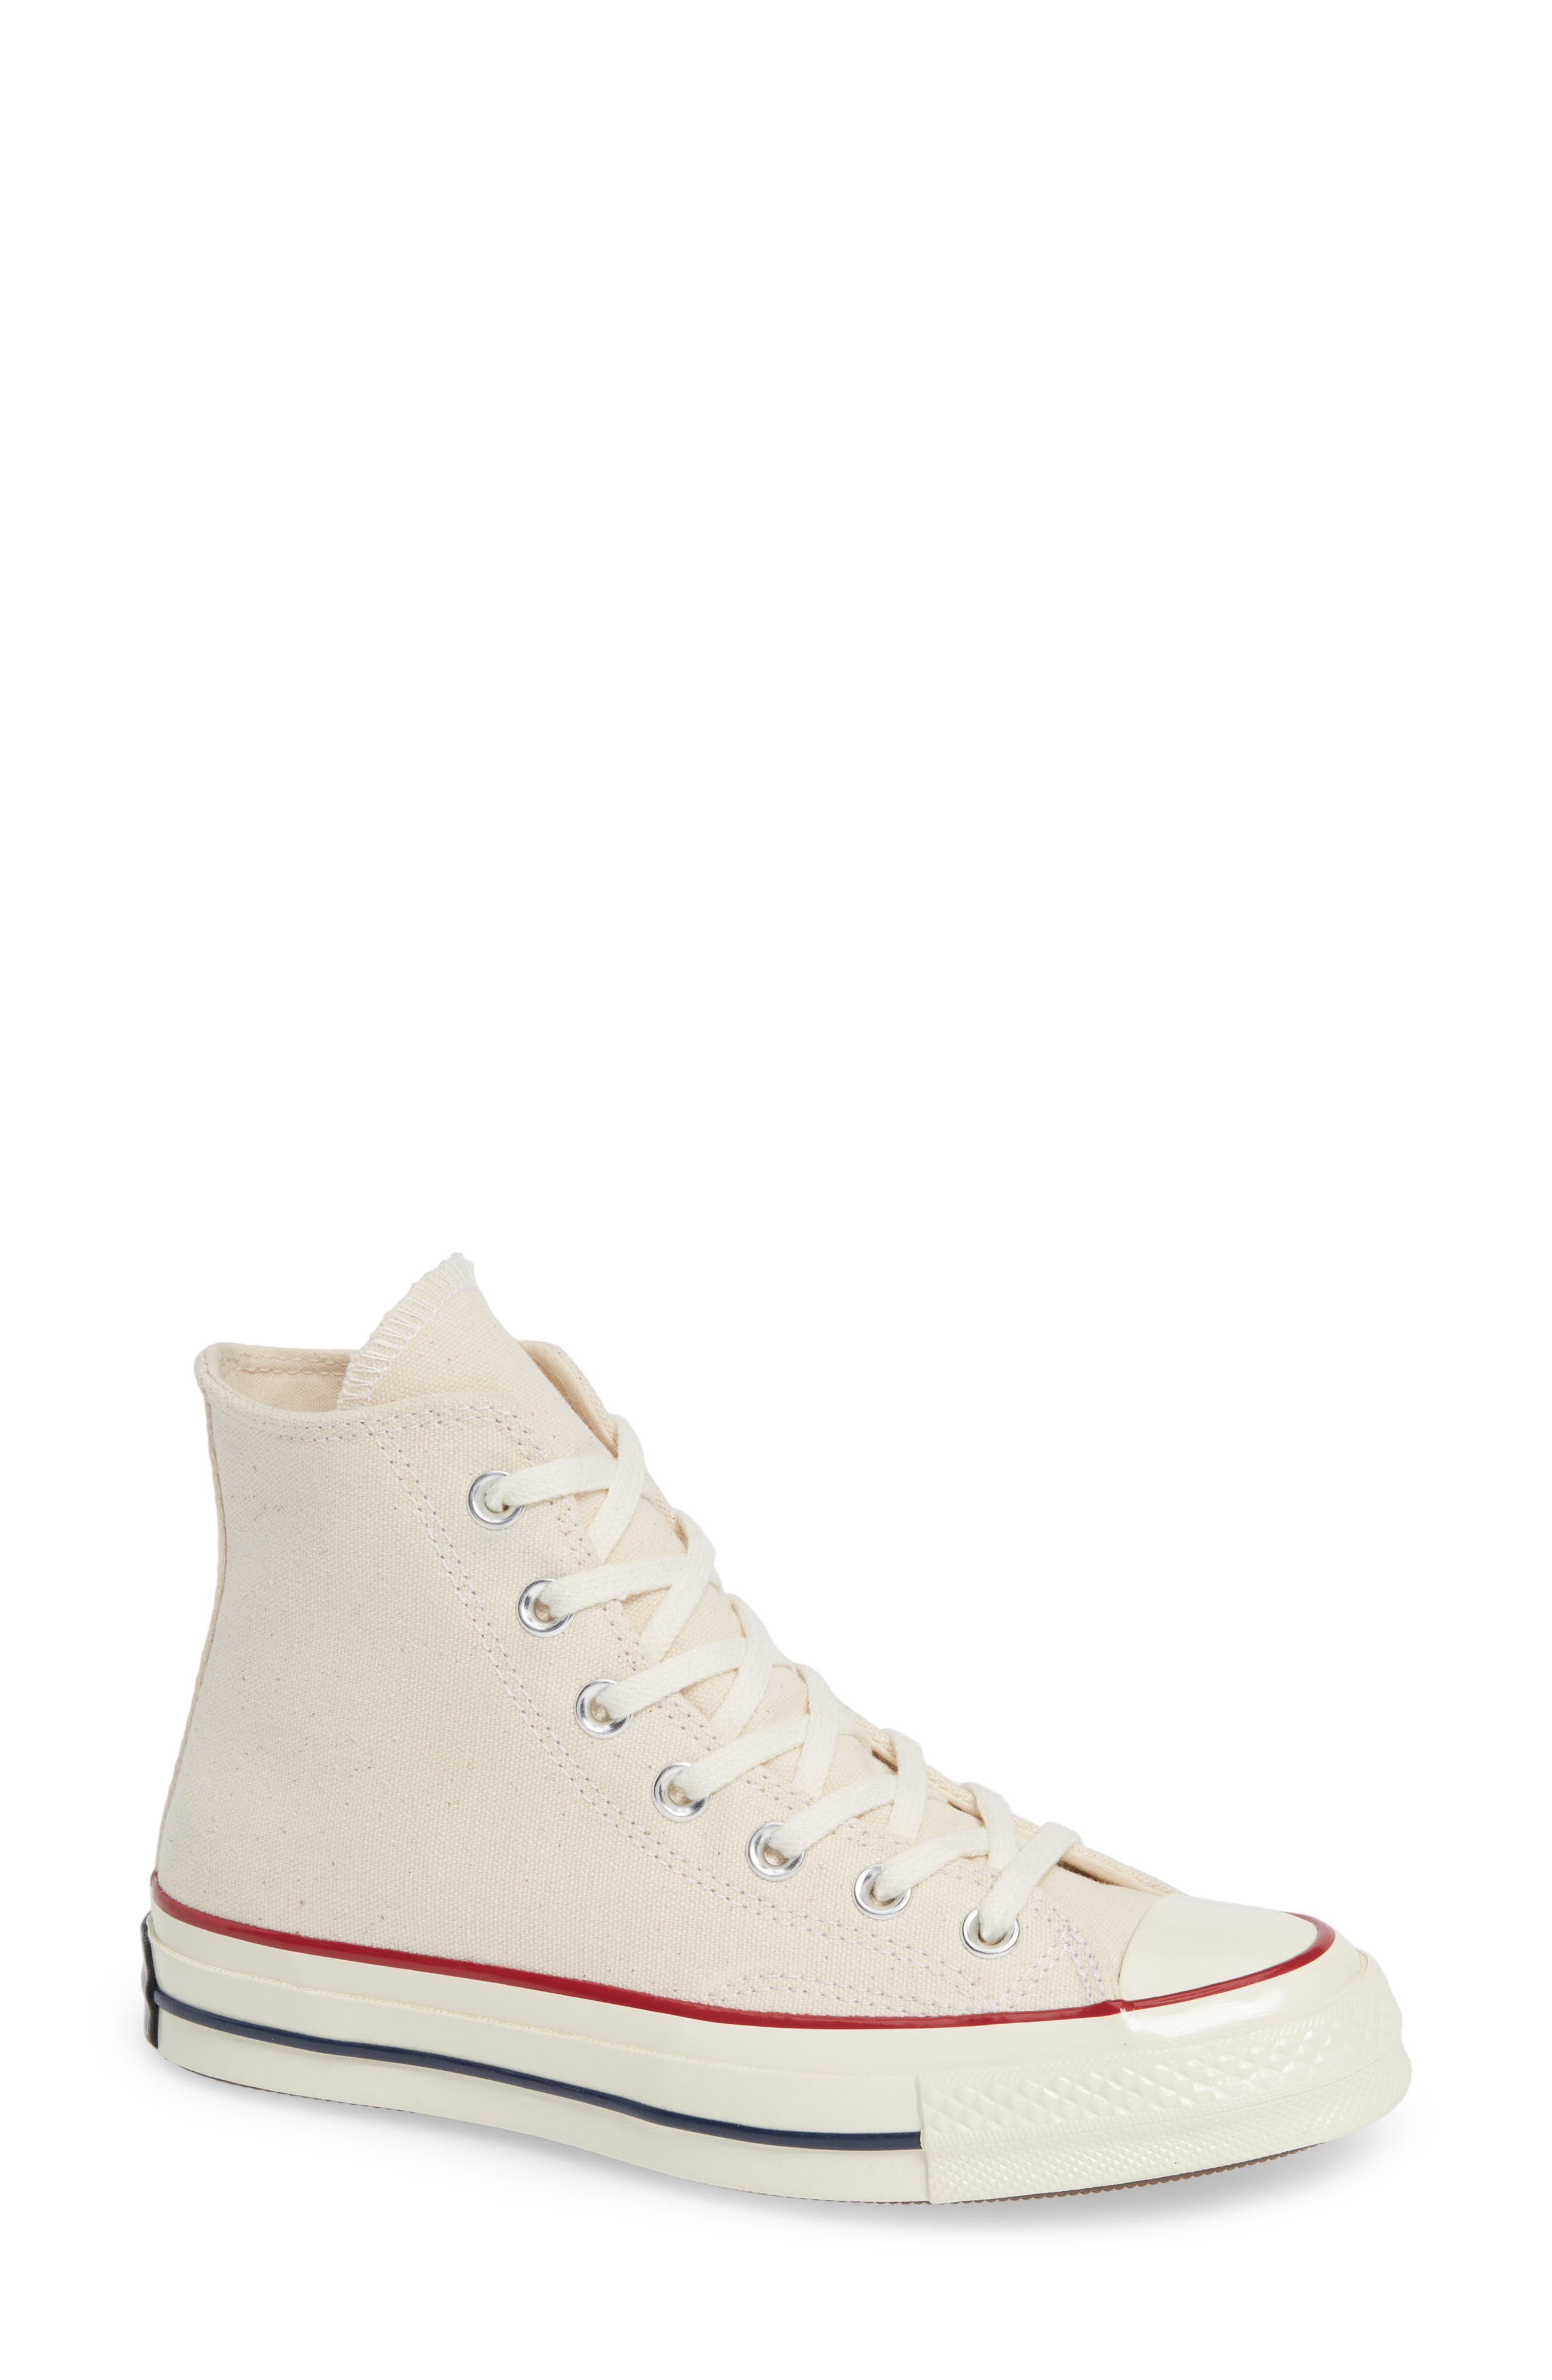 Converse Chuck Taylor All Star Chuck 70 High Top Sneaker, Ivory